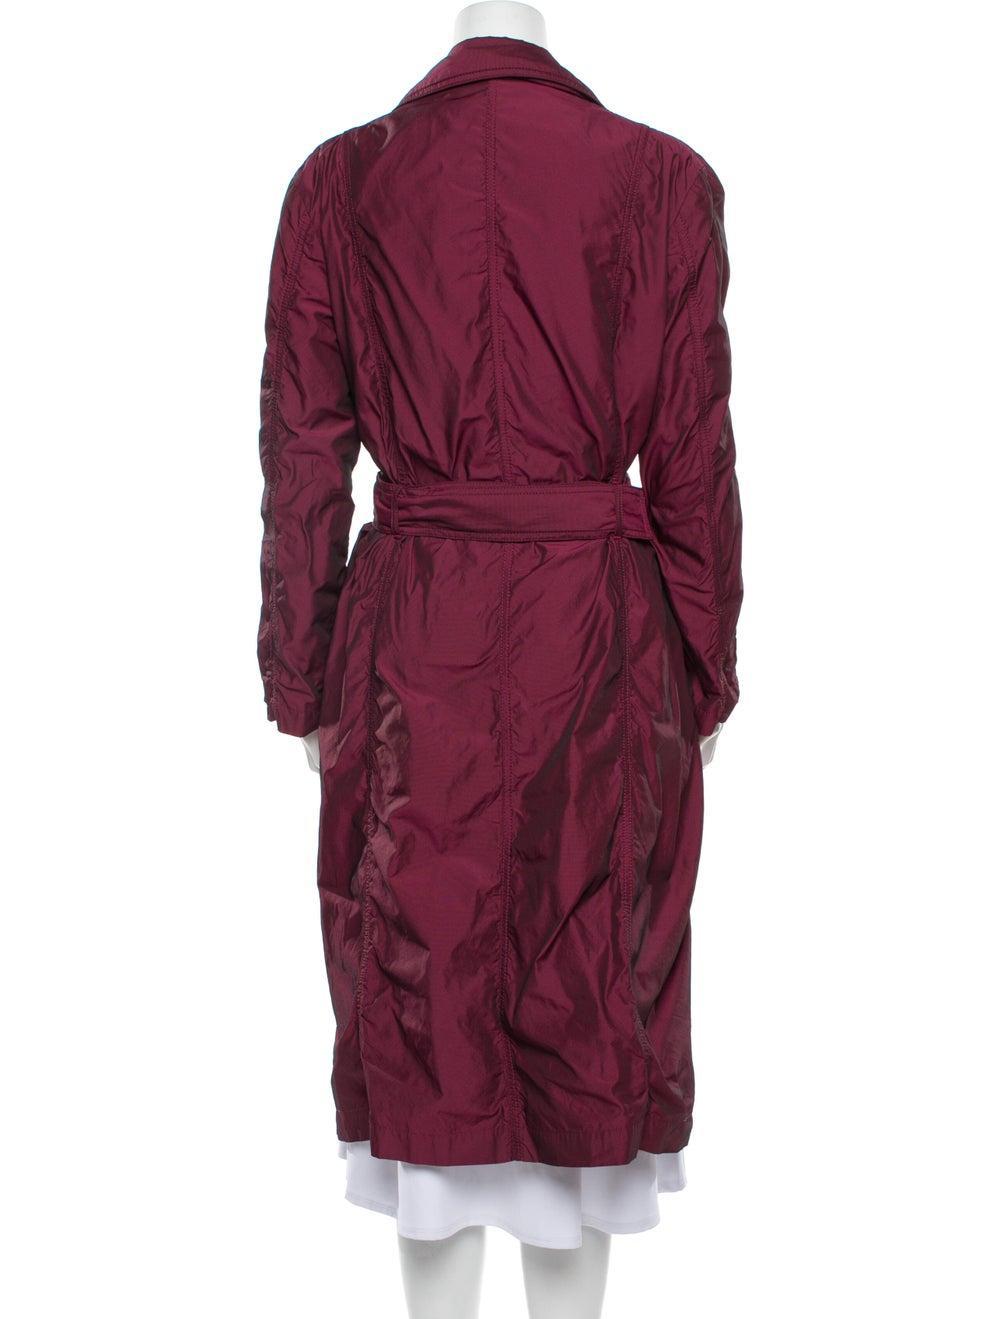 Issey Miyake Trench Coat Pink - image 3